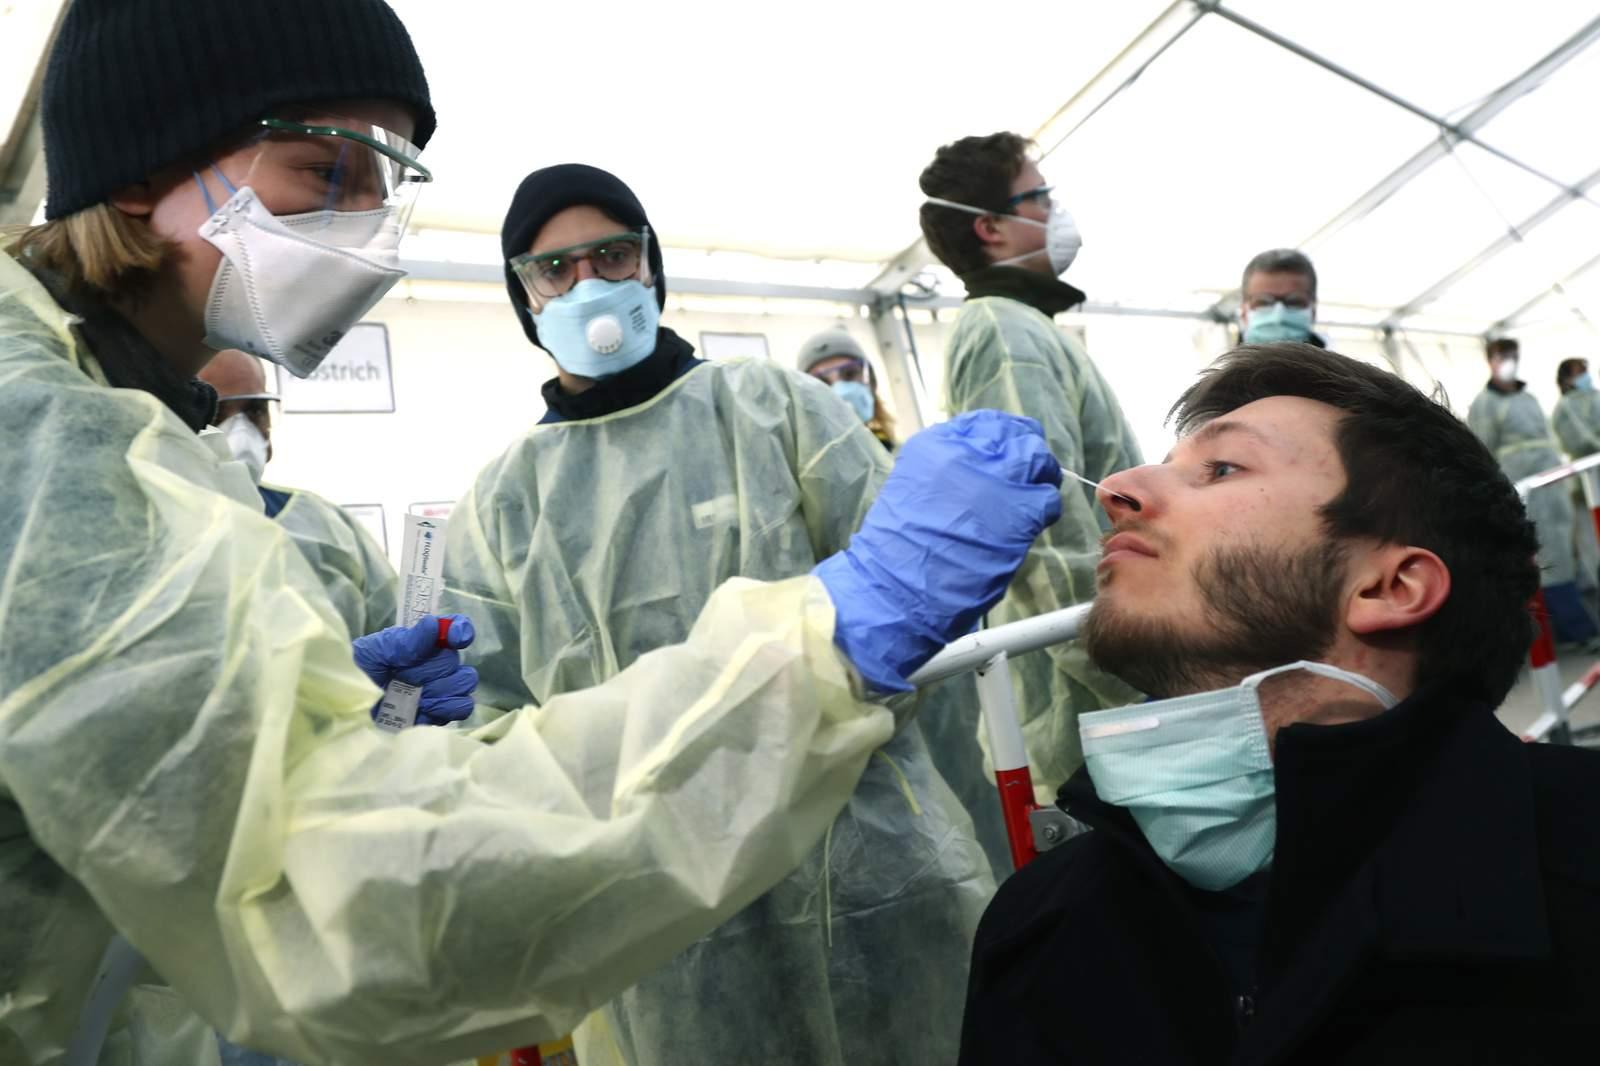 Alemania puntúa temprano contra virus 56